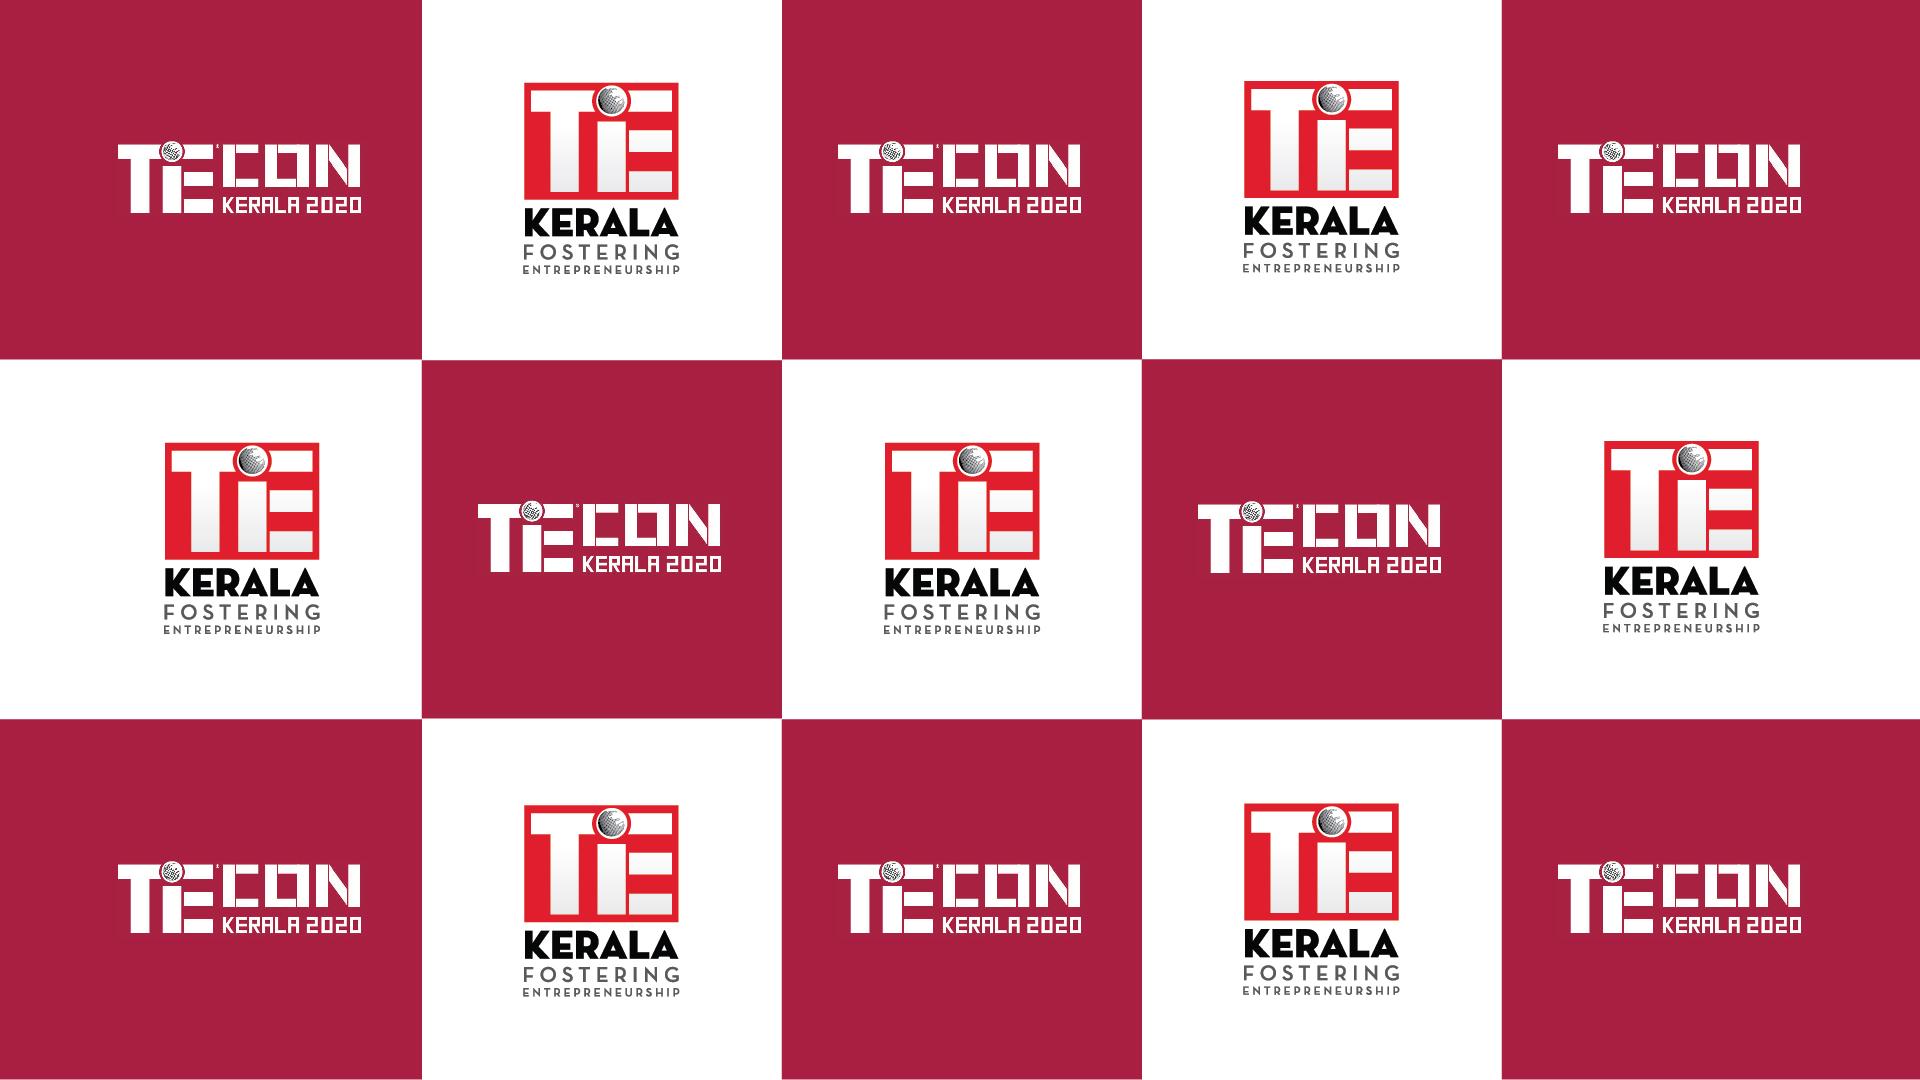 TiEcon Kerala 2020